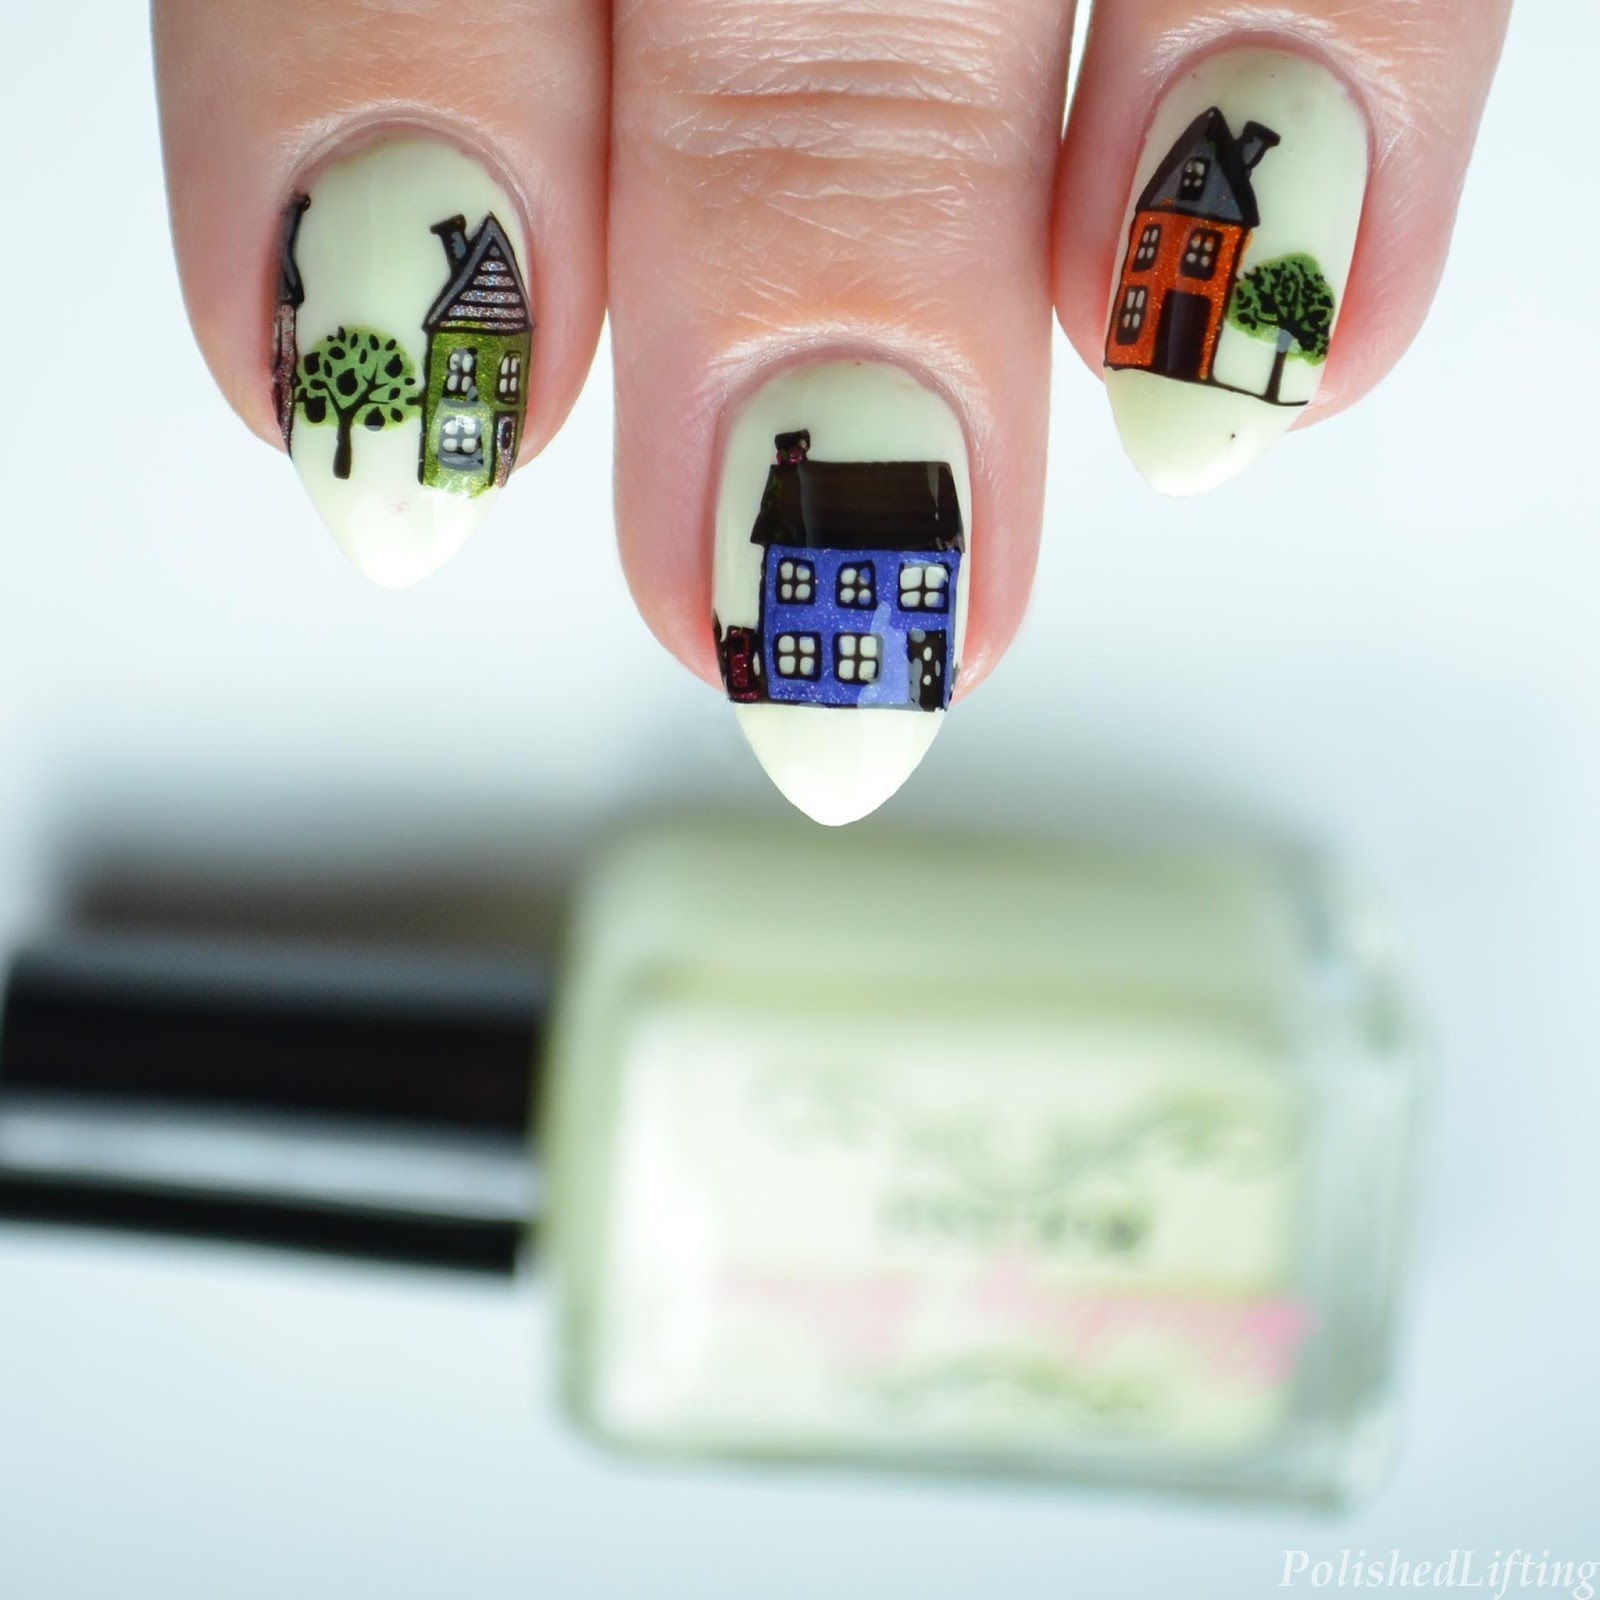 Polished Lifting City Nail Art Featuring Moyou London